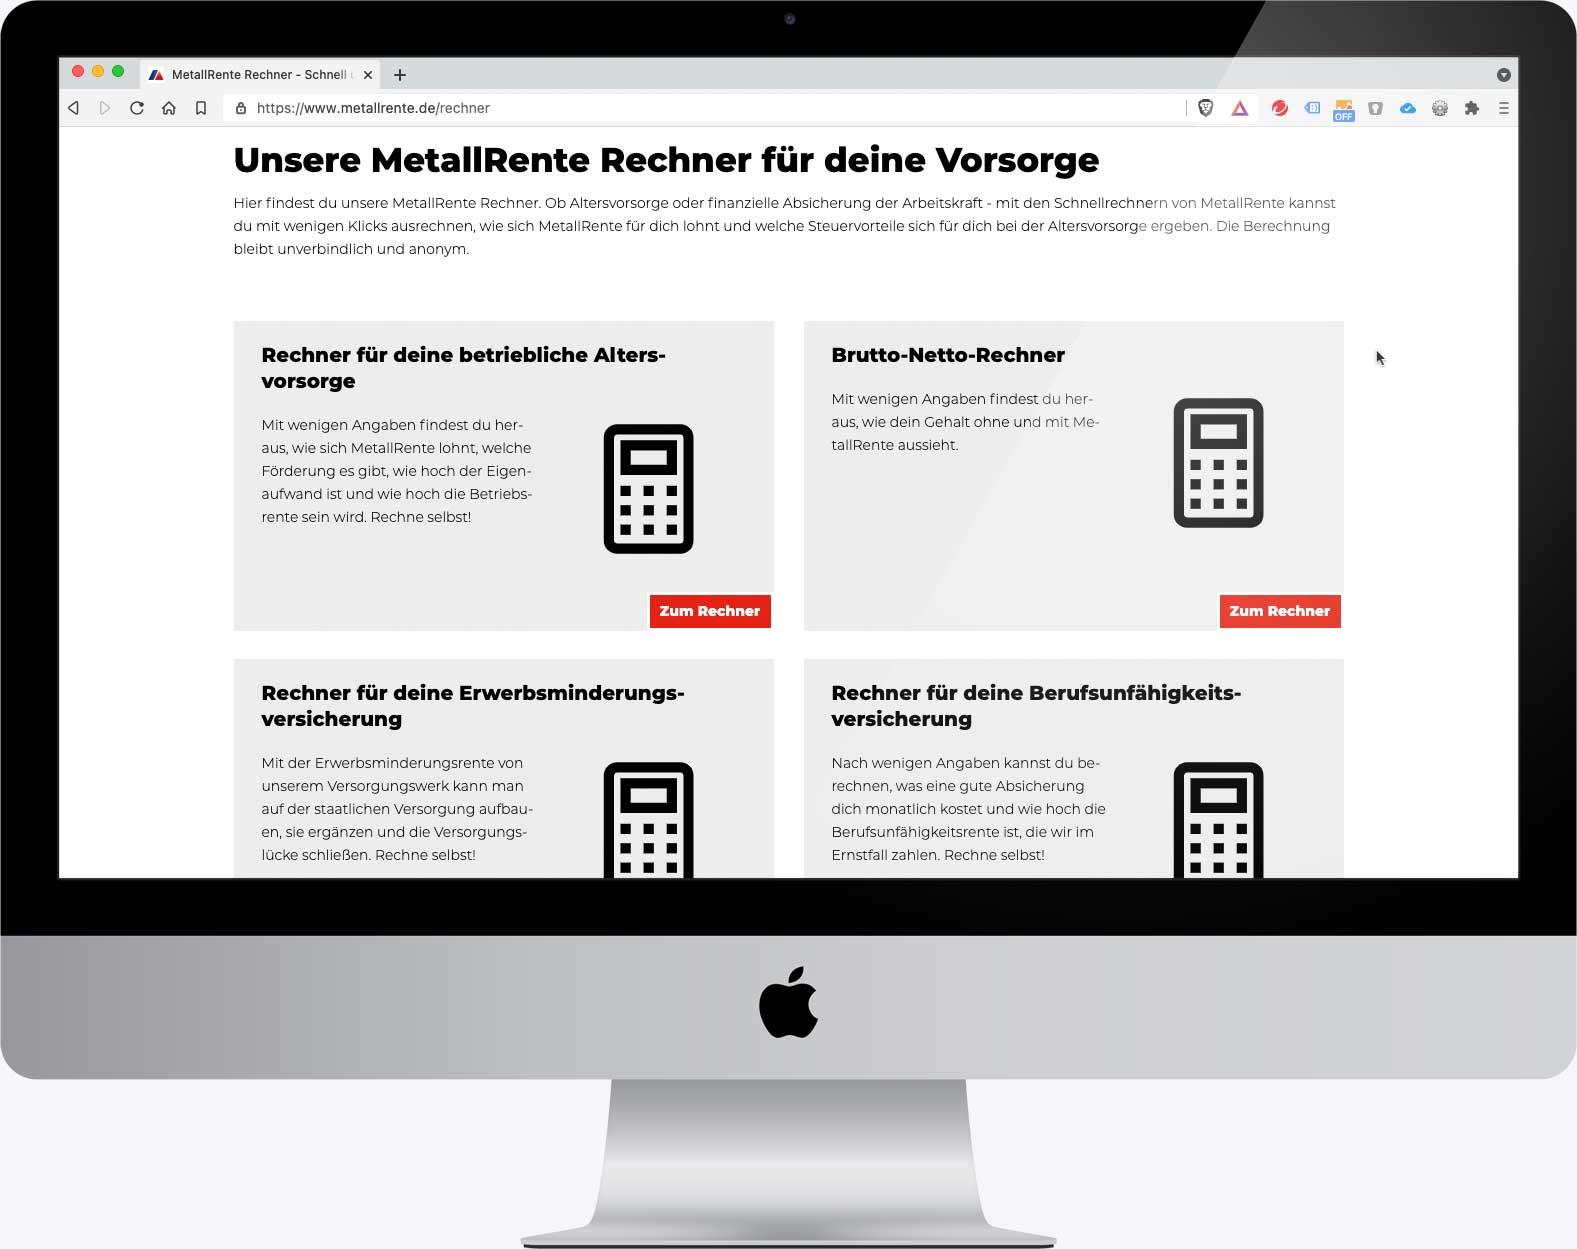 Verschiedene Beitragsrechner in der Website www.metallrente.de